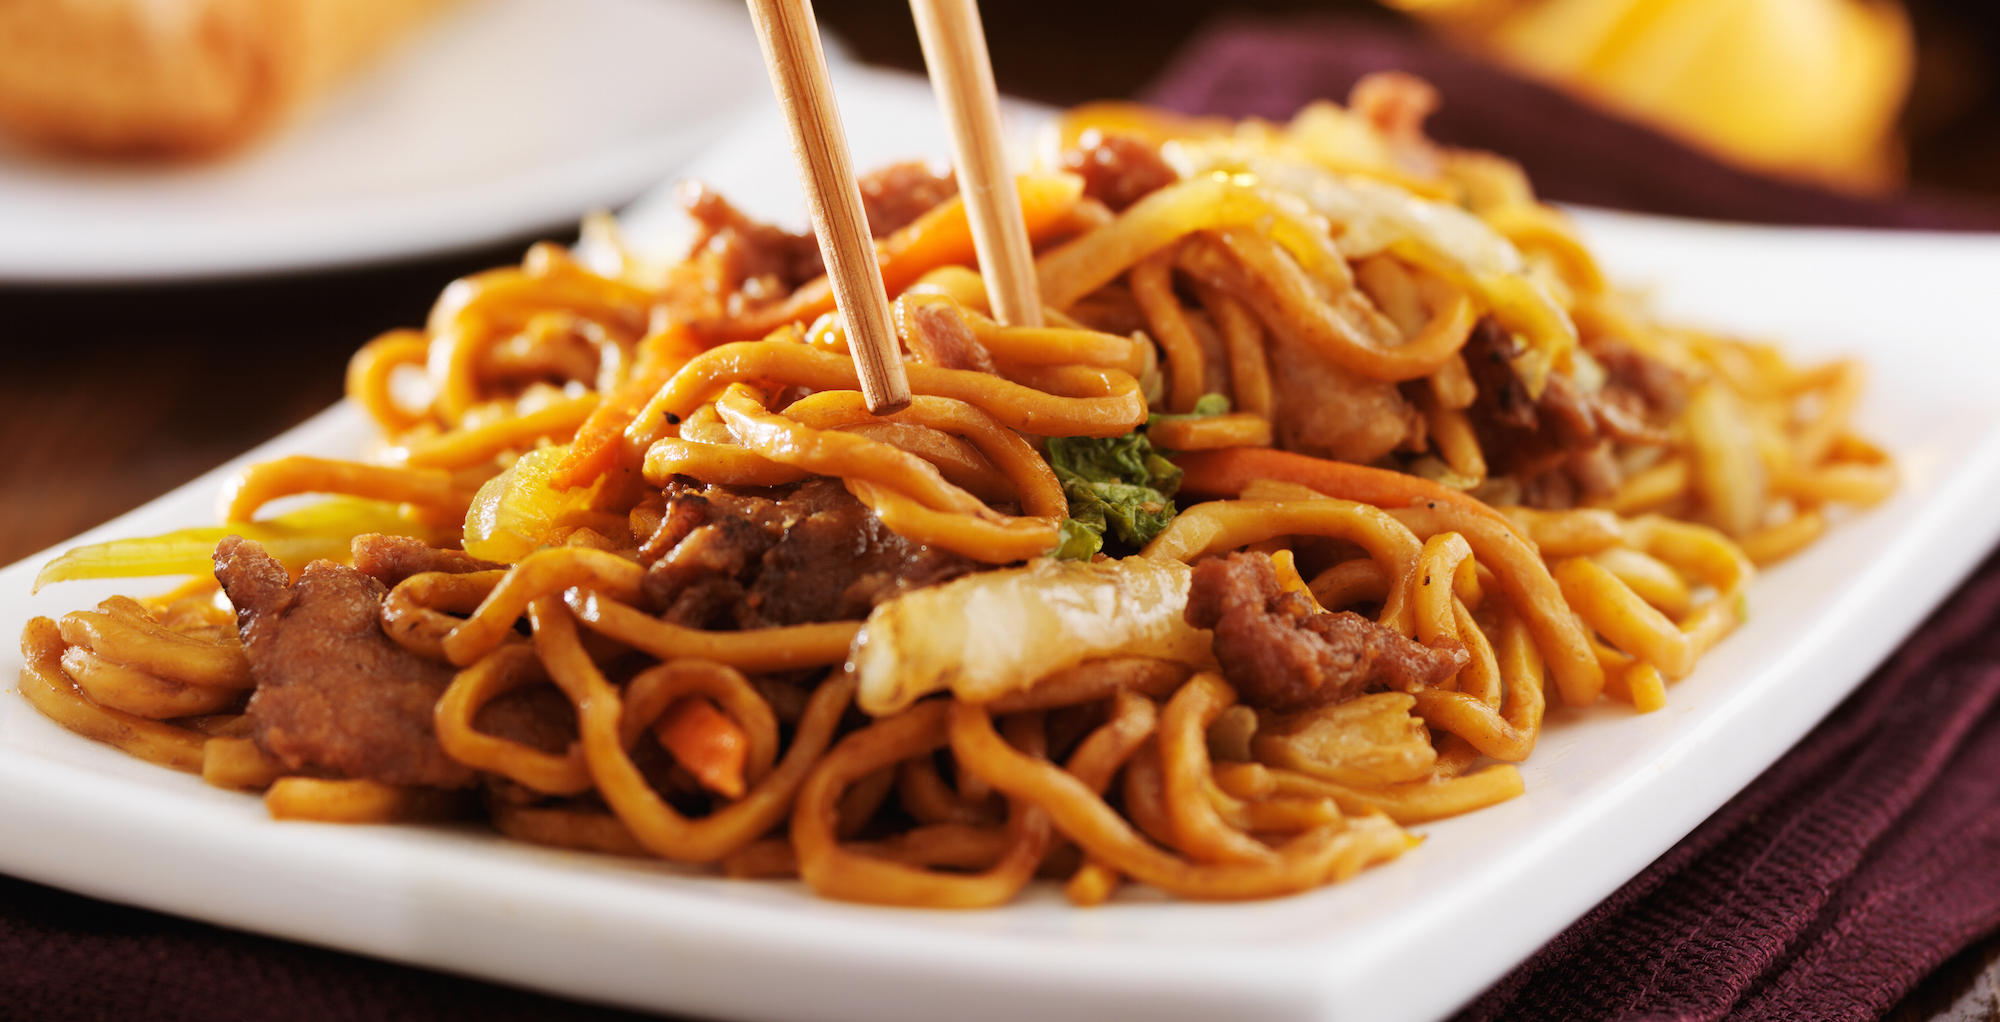 Chinese restuarants in Leeds